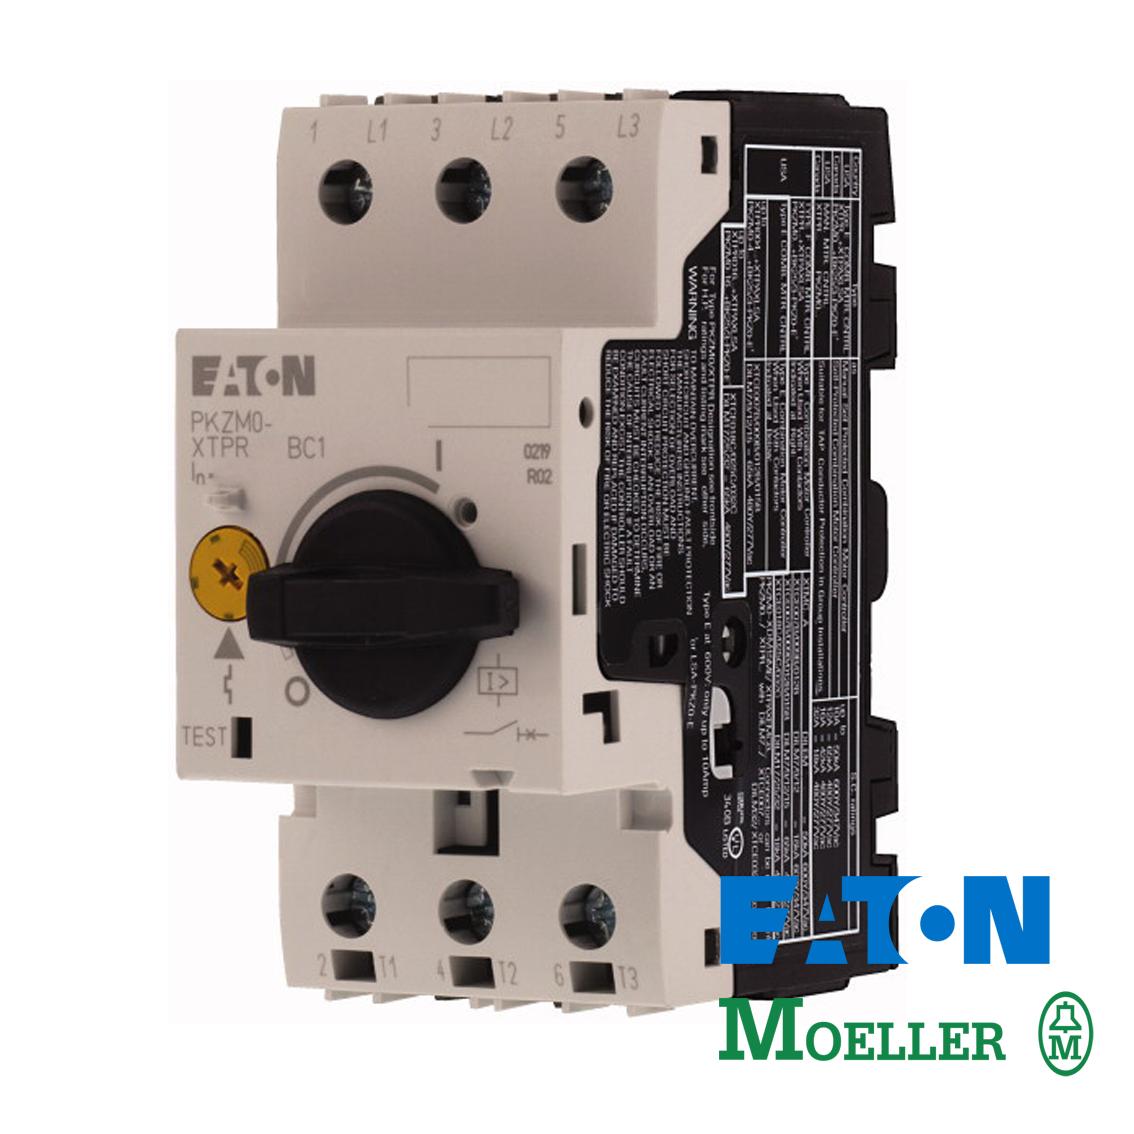 Motorni zaštitni prekidač PKZM0-1,6 Eaton-Moeller Elektro Vukojevic